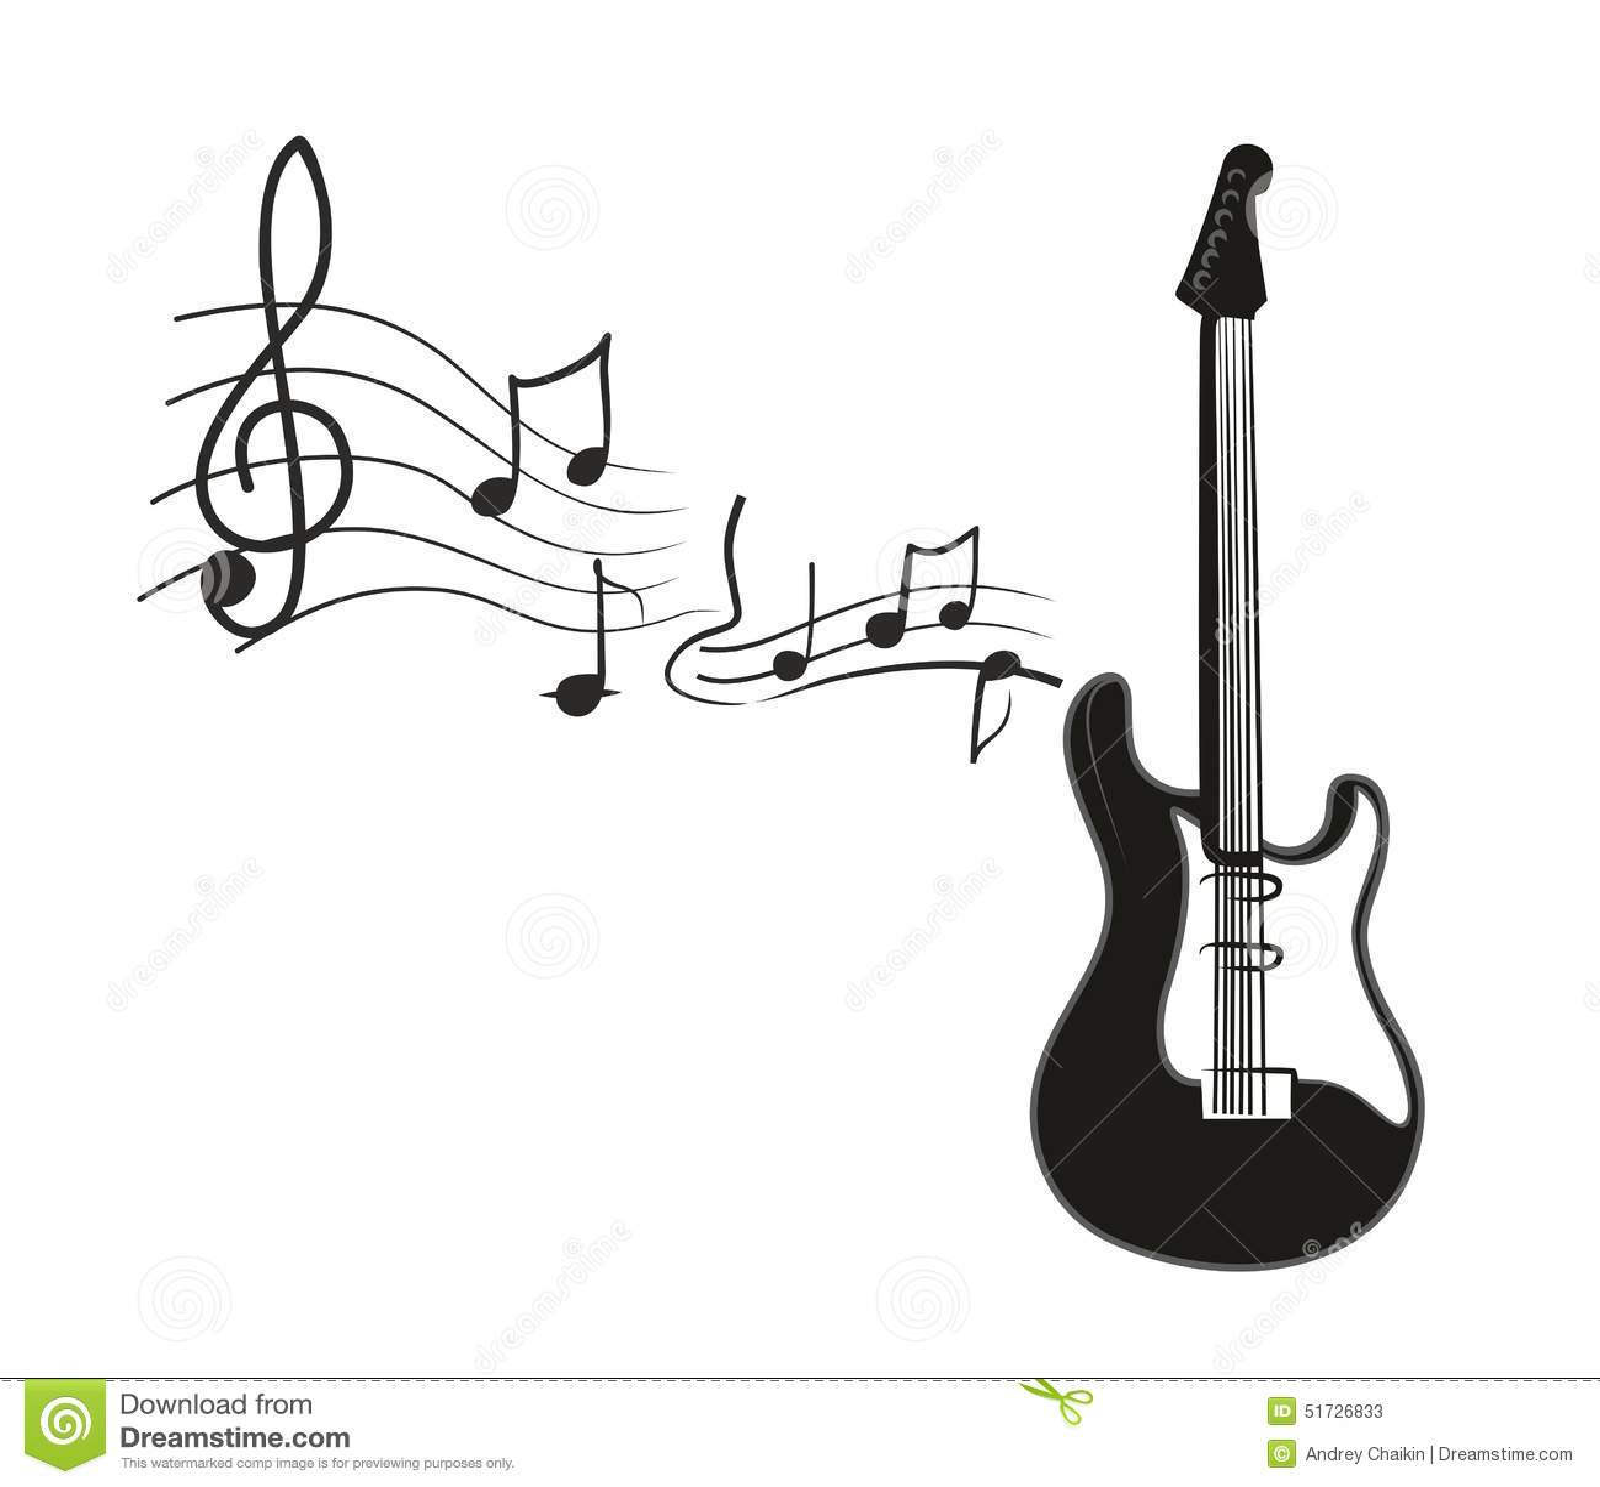 electric guitar stock vector illustration of sound clip art music notes symbols clip art music notes border